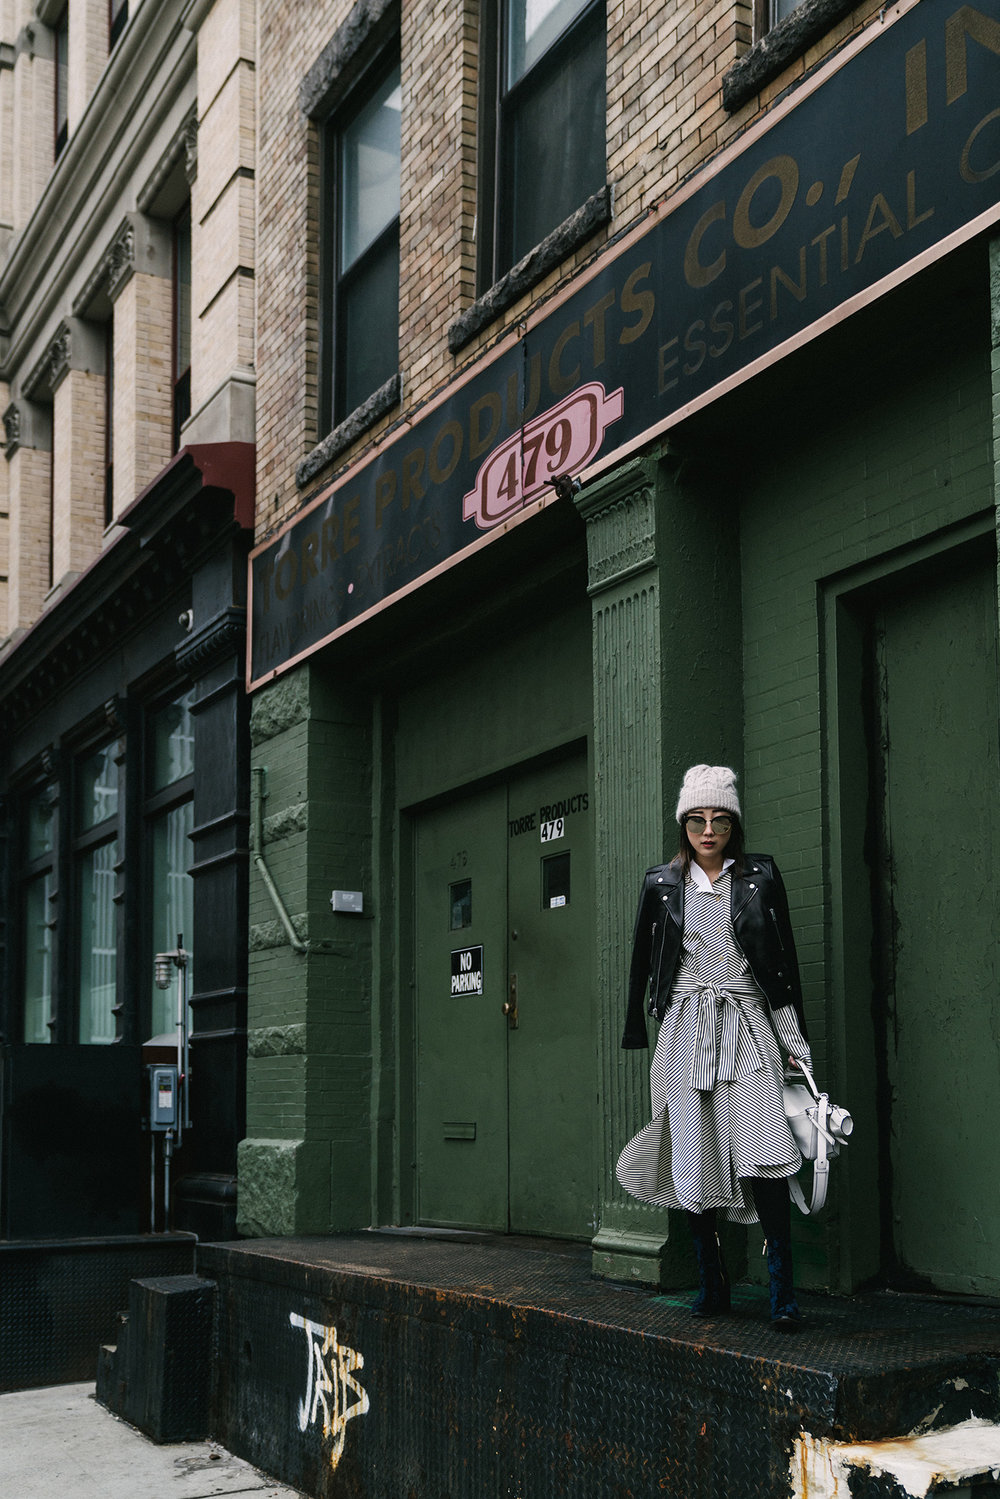 Saint Laurent Jacket, Loewe Dress and Bag, Dear Frances Boots, Gentle Monster Sunglasses, COS Beanie